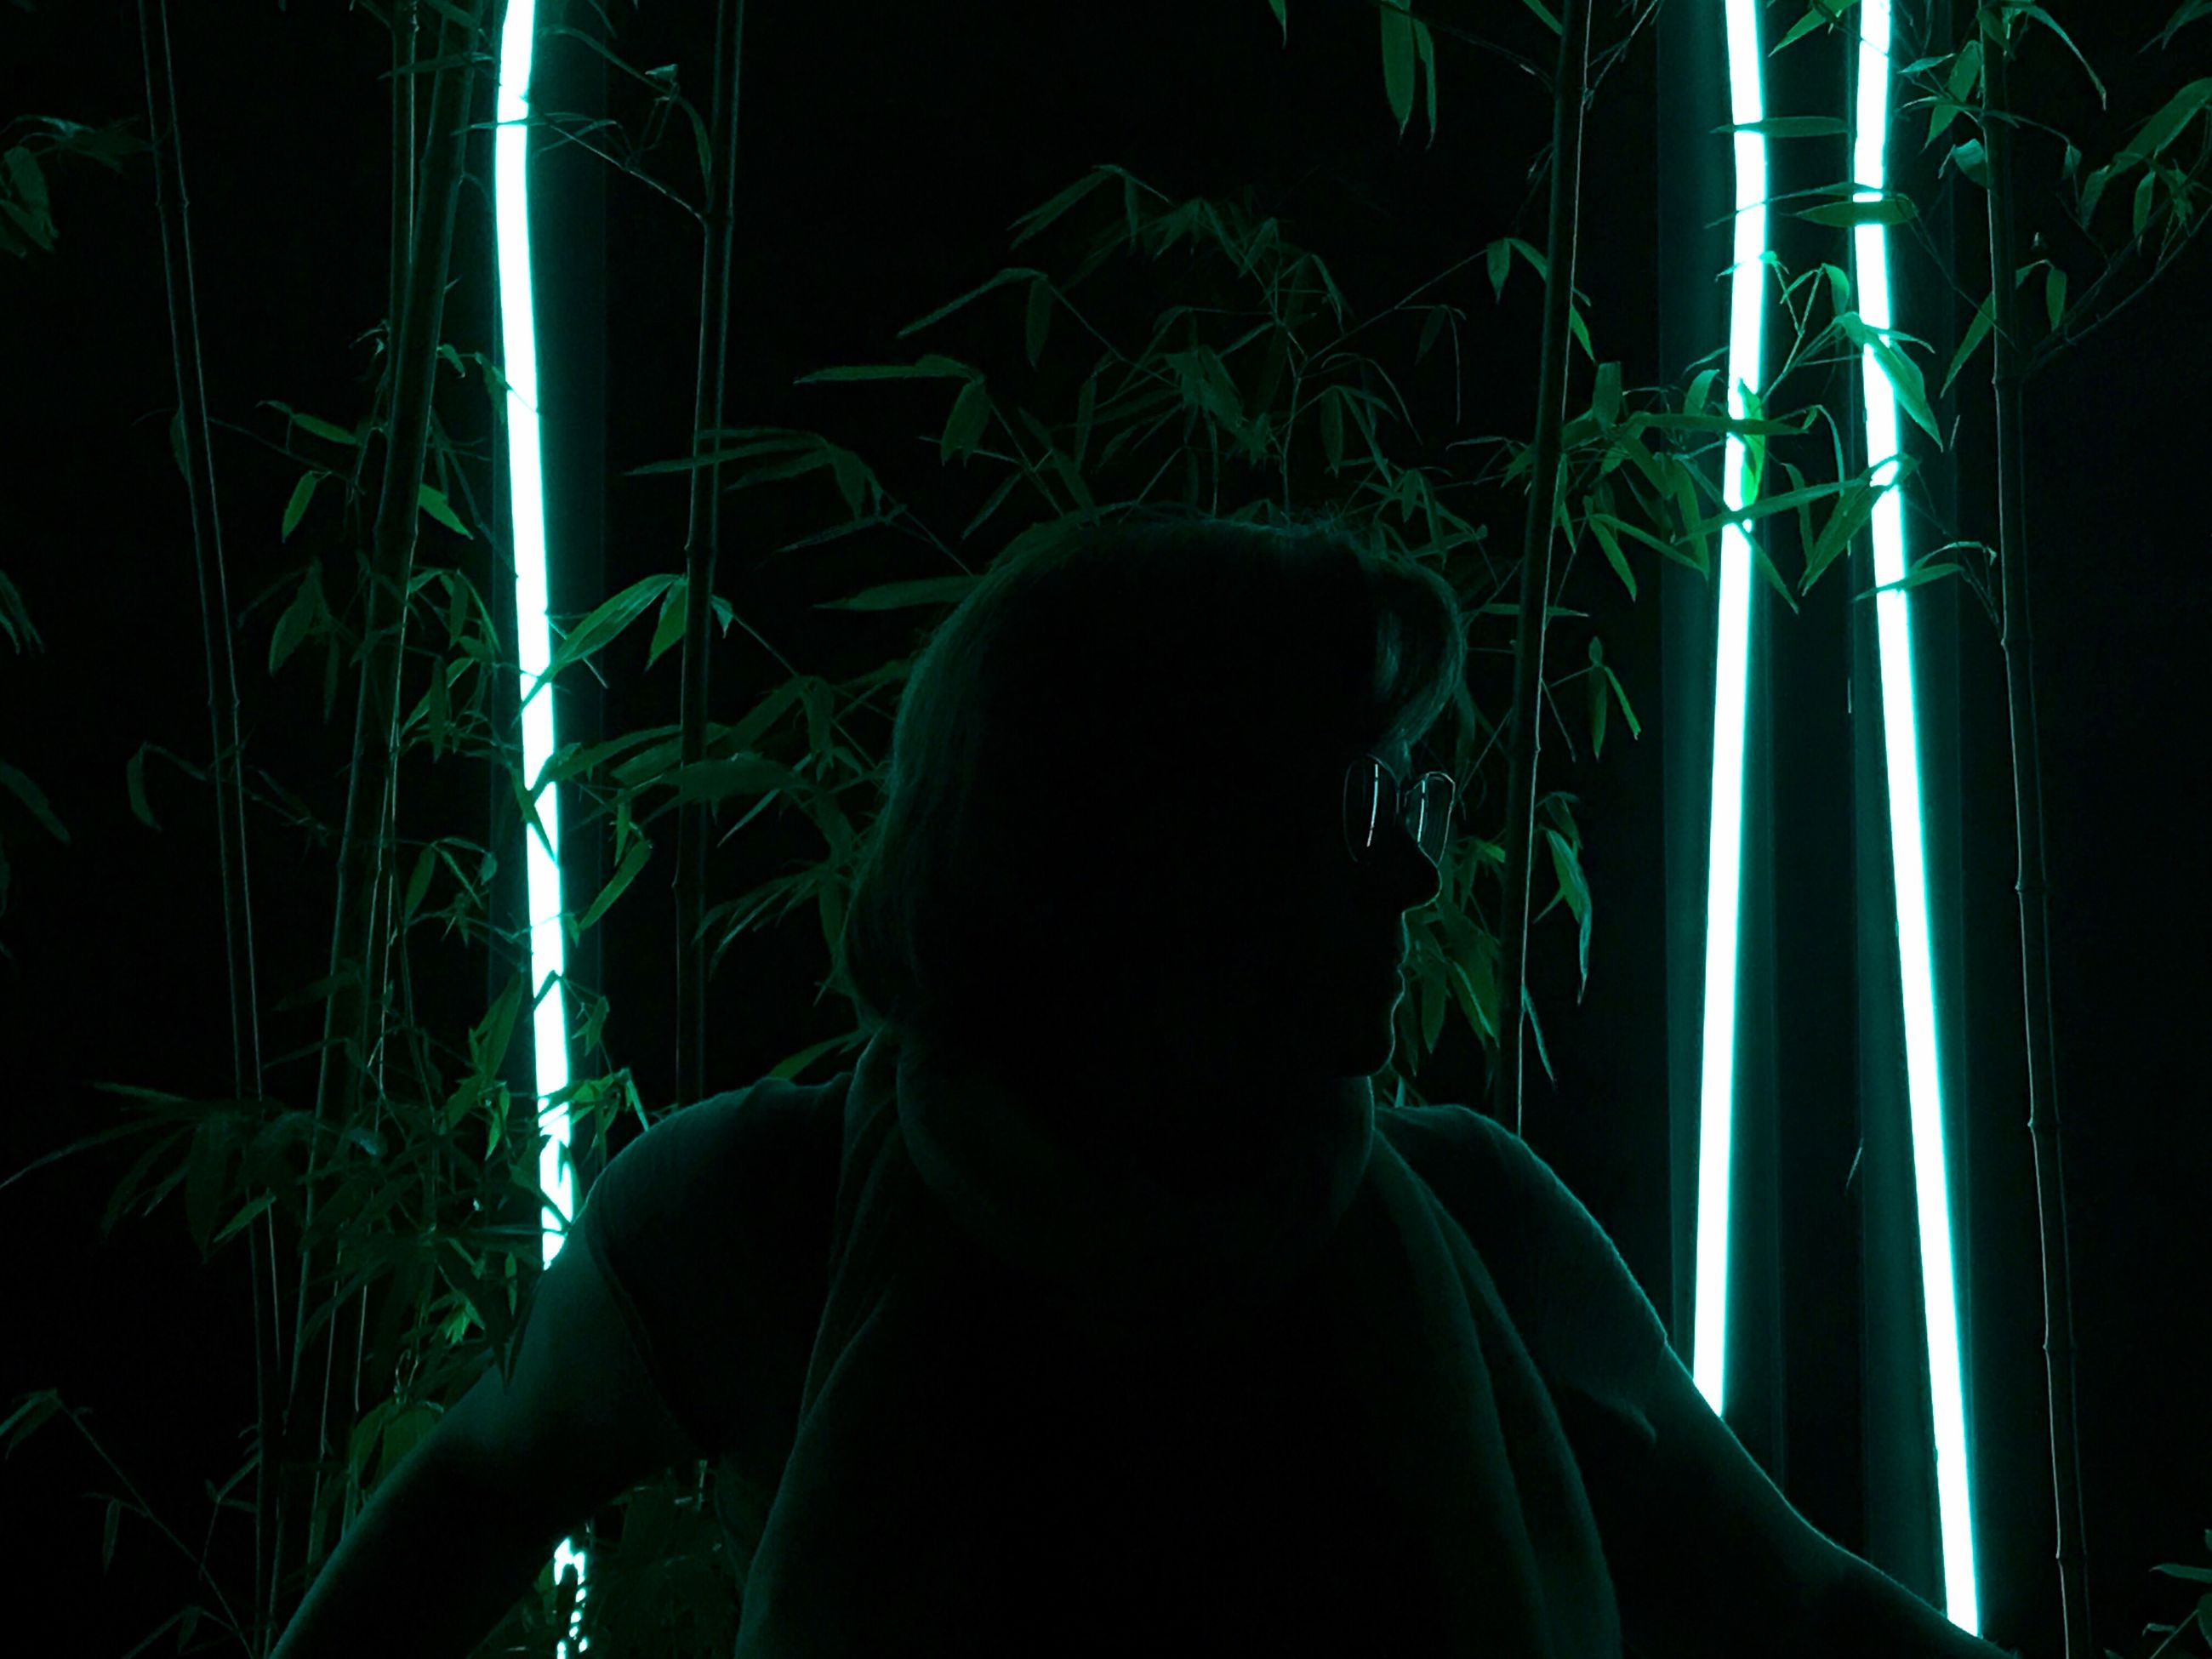 illuminated, real people, one person, lifestyles, green color, night, leisure activity, lighting equipment, light - natural phenomenon, headshot, dark, glowing, indoors, rear view, standing, portrait, light, men, nightlife